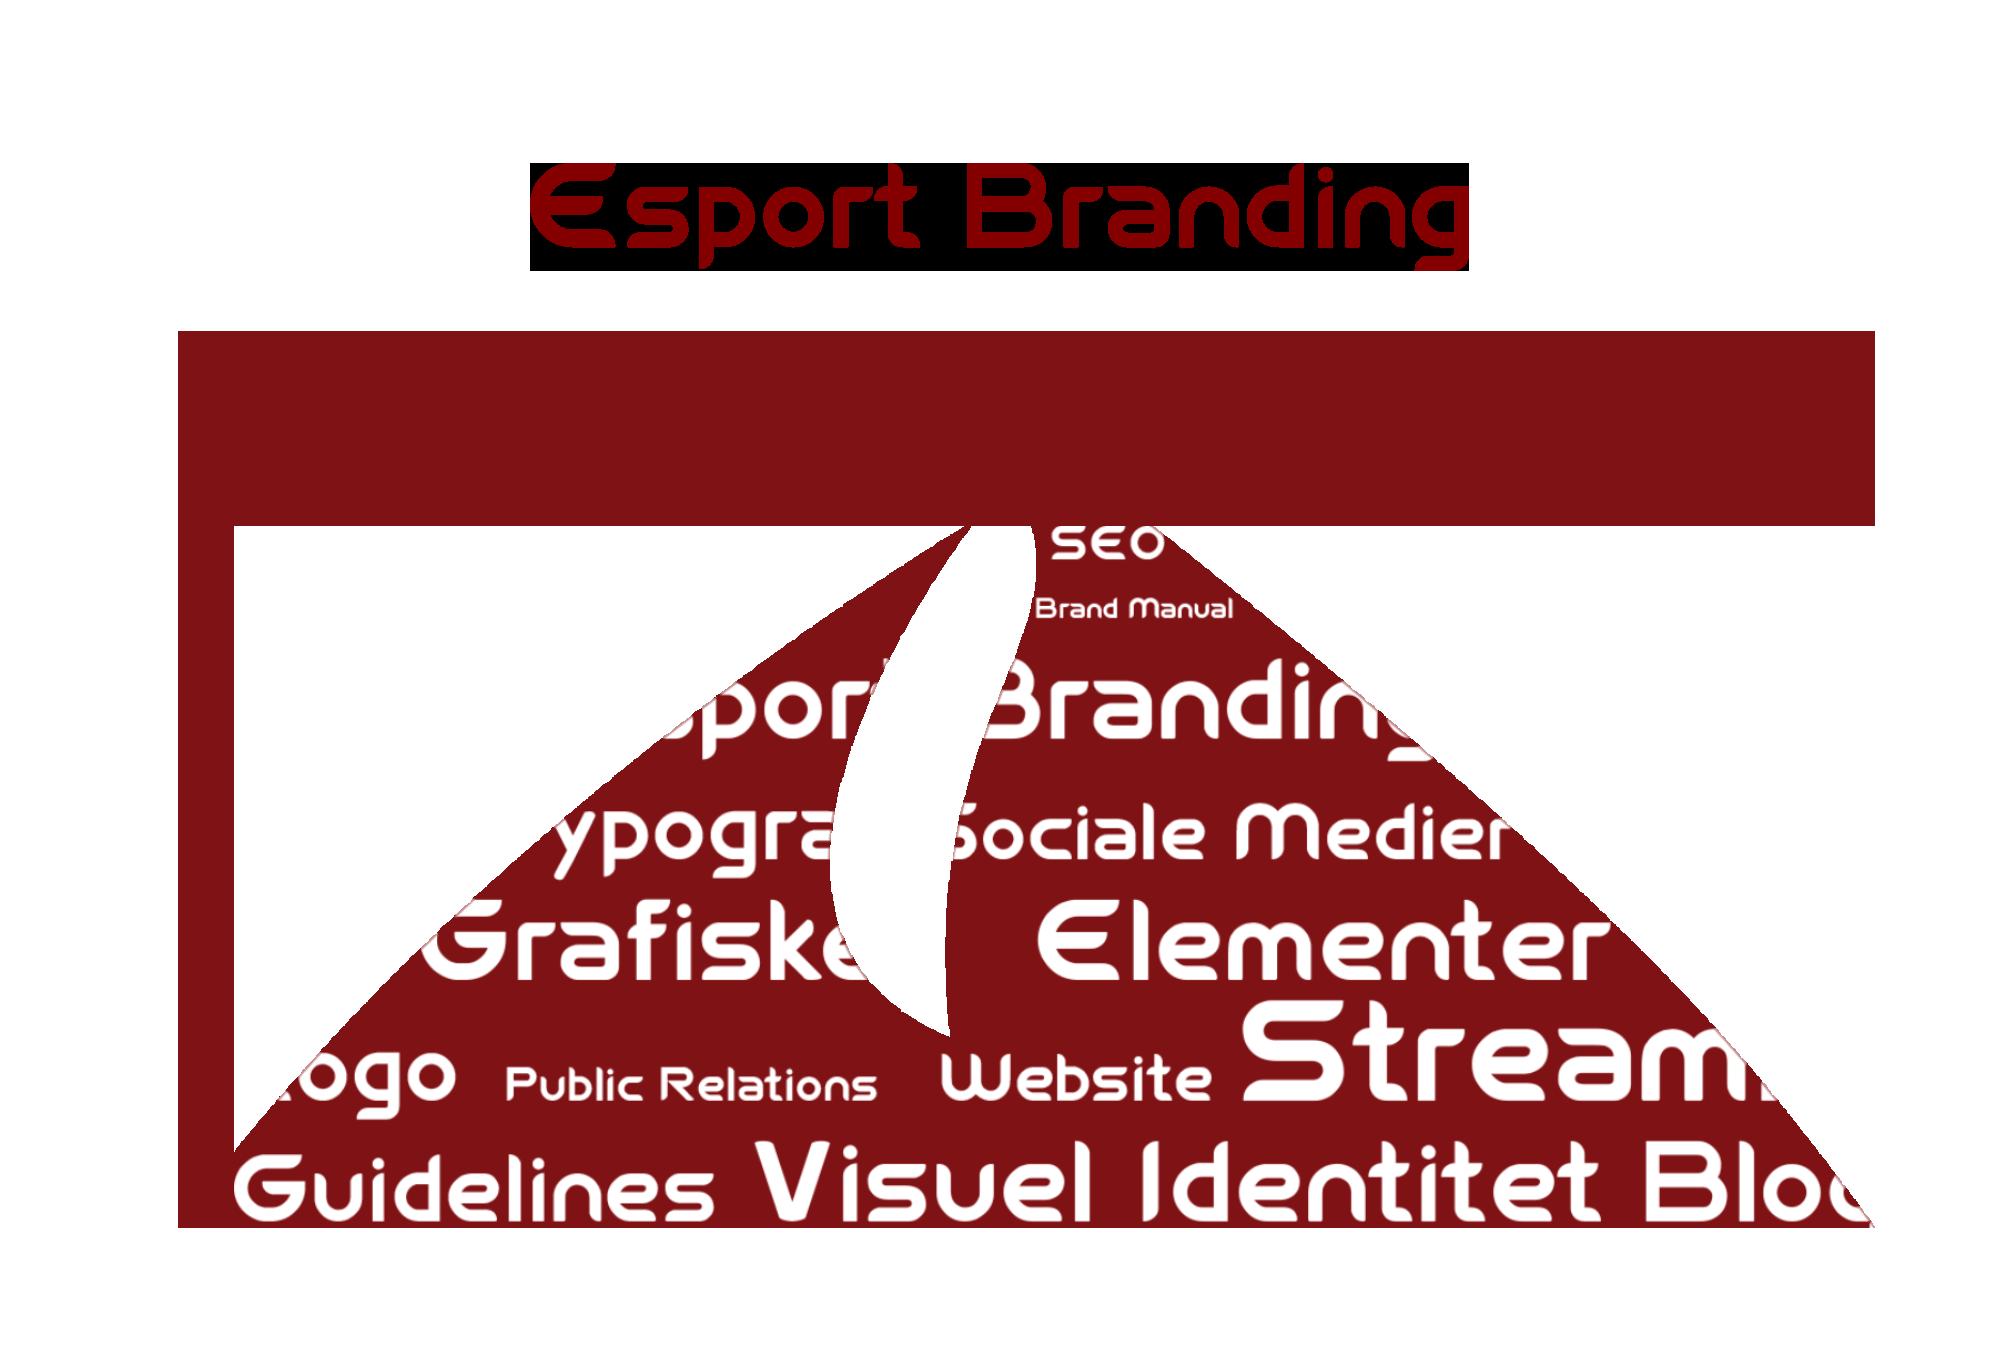 Epparel Esport Branding